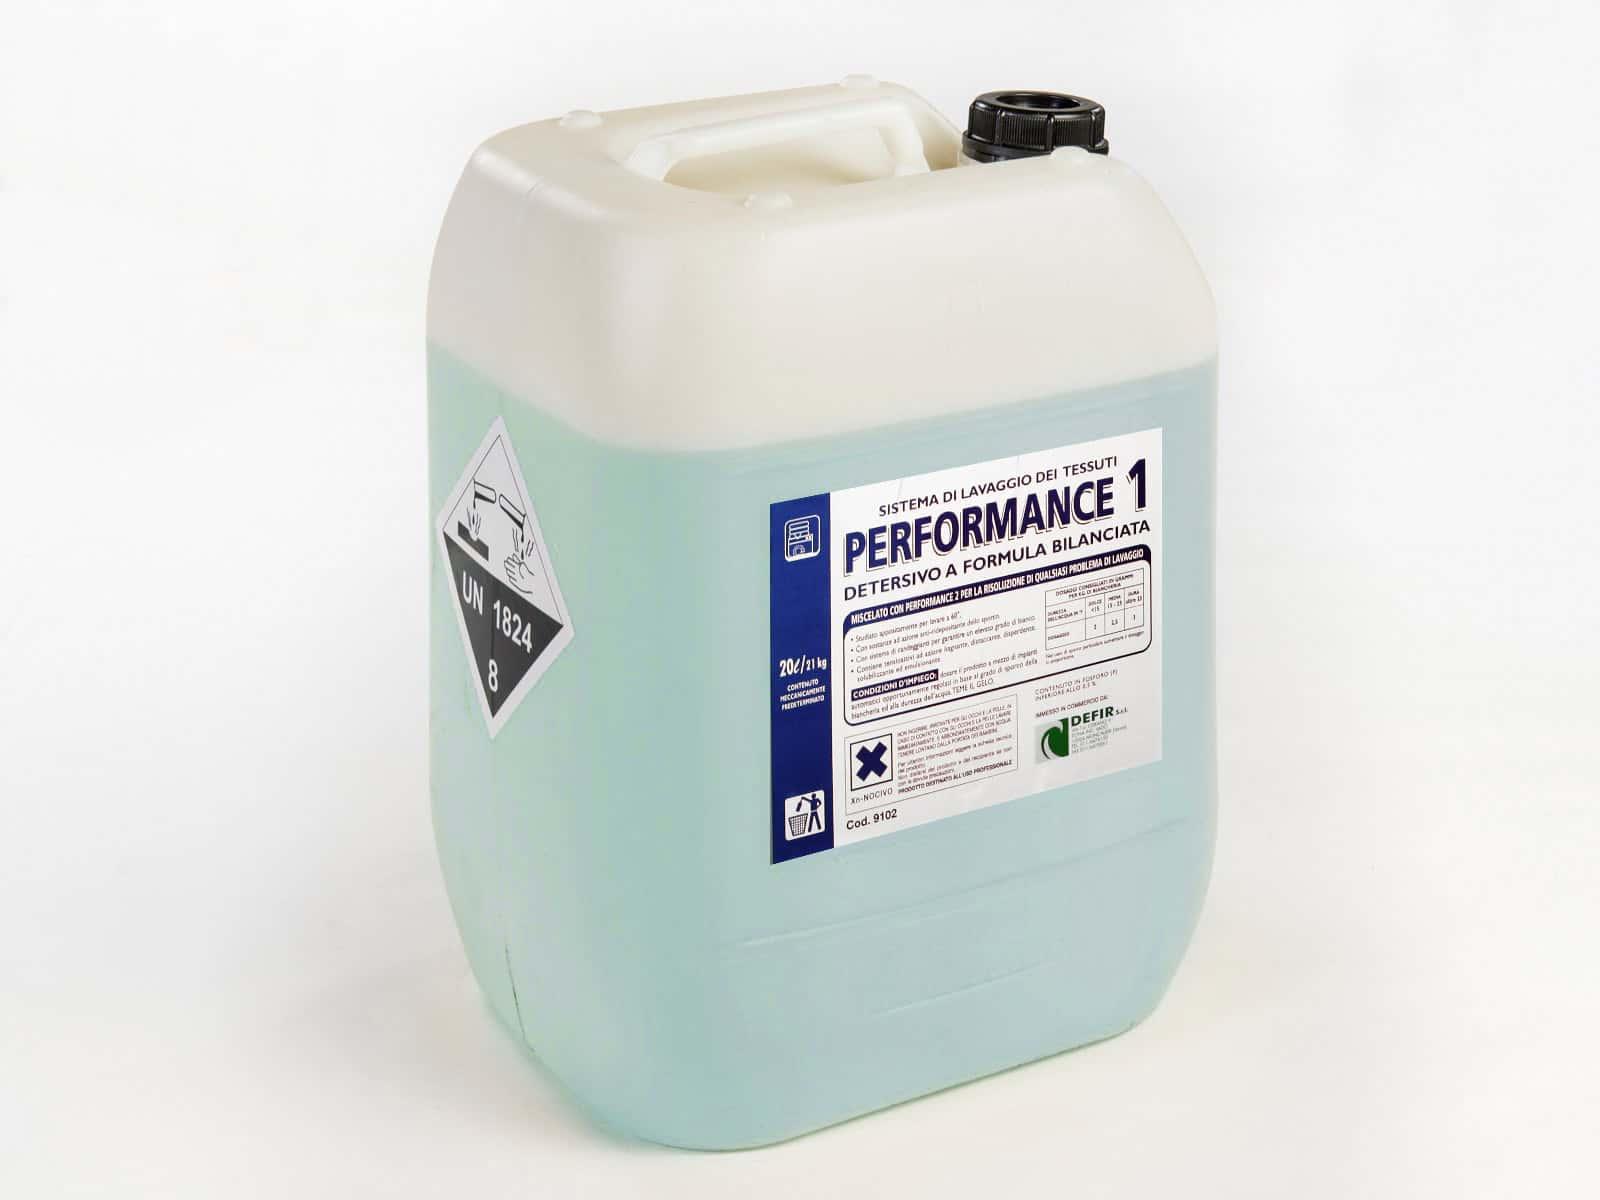 Performance 1 lavaggio tessuti industriale 21kg - Defir detergenti Moncalieri Torino